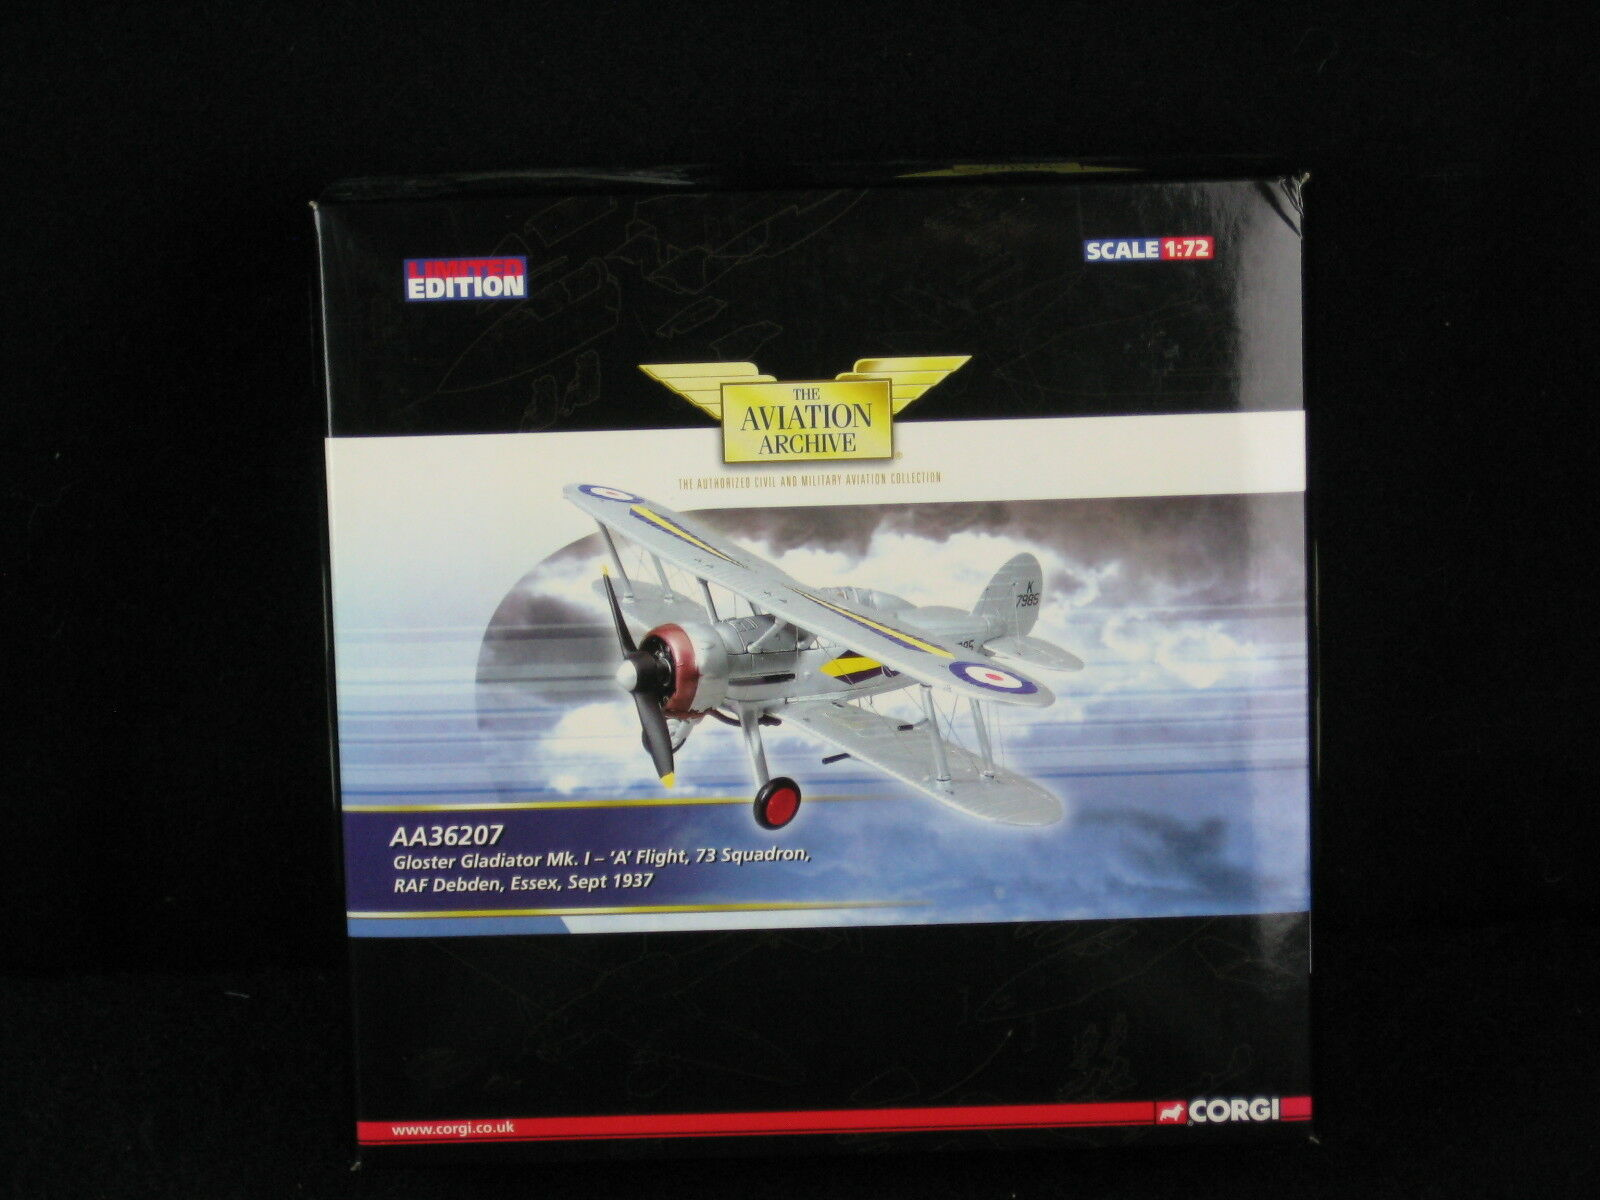 CORGI AA36207 Gloster Gladiator Mk1 UN VOL 73 ESC 1937 ltd ed